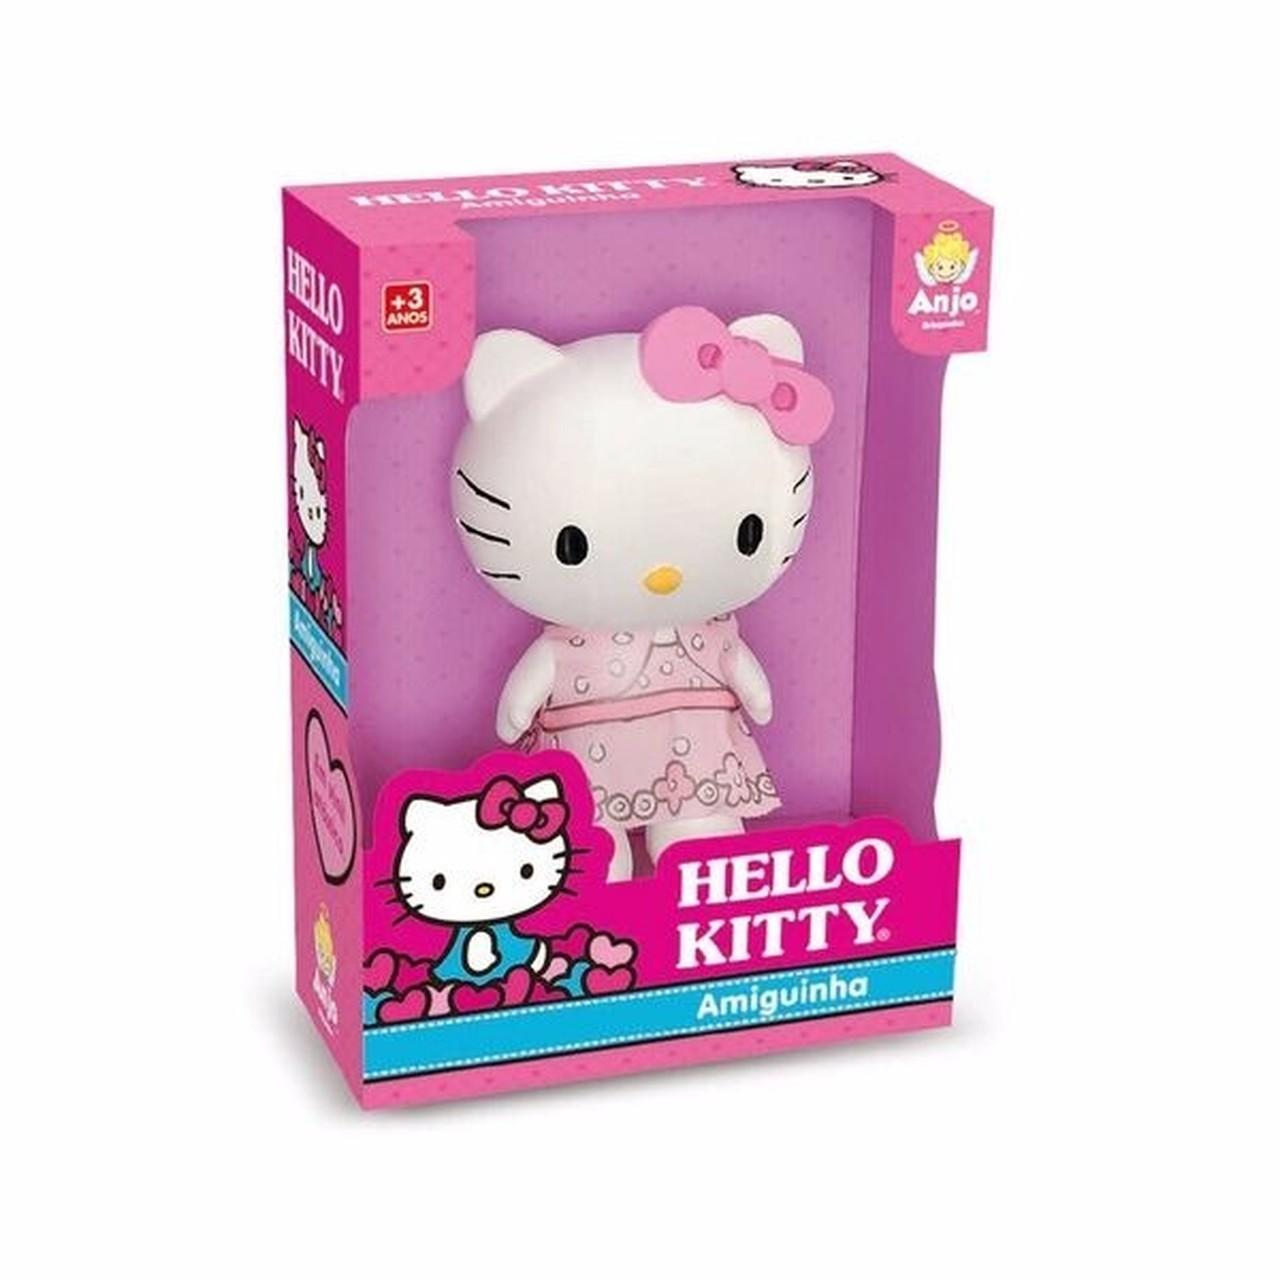 Boneca Hello Kitty Amiguinha 18 cm - Angel Toys